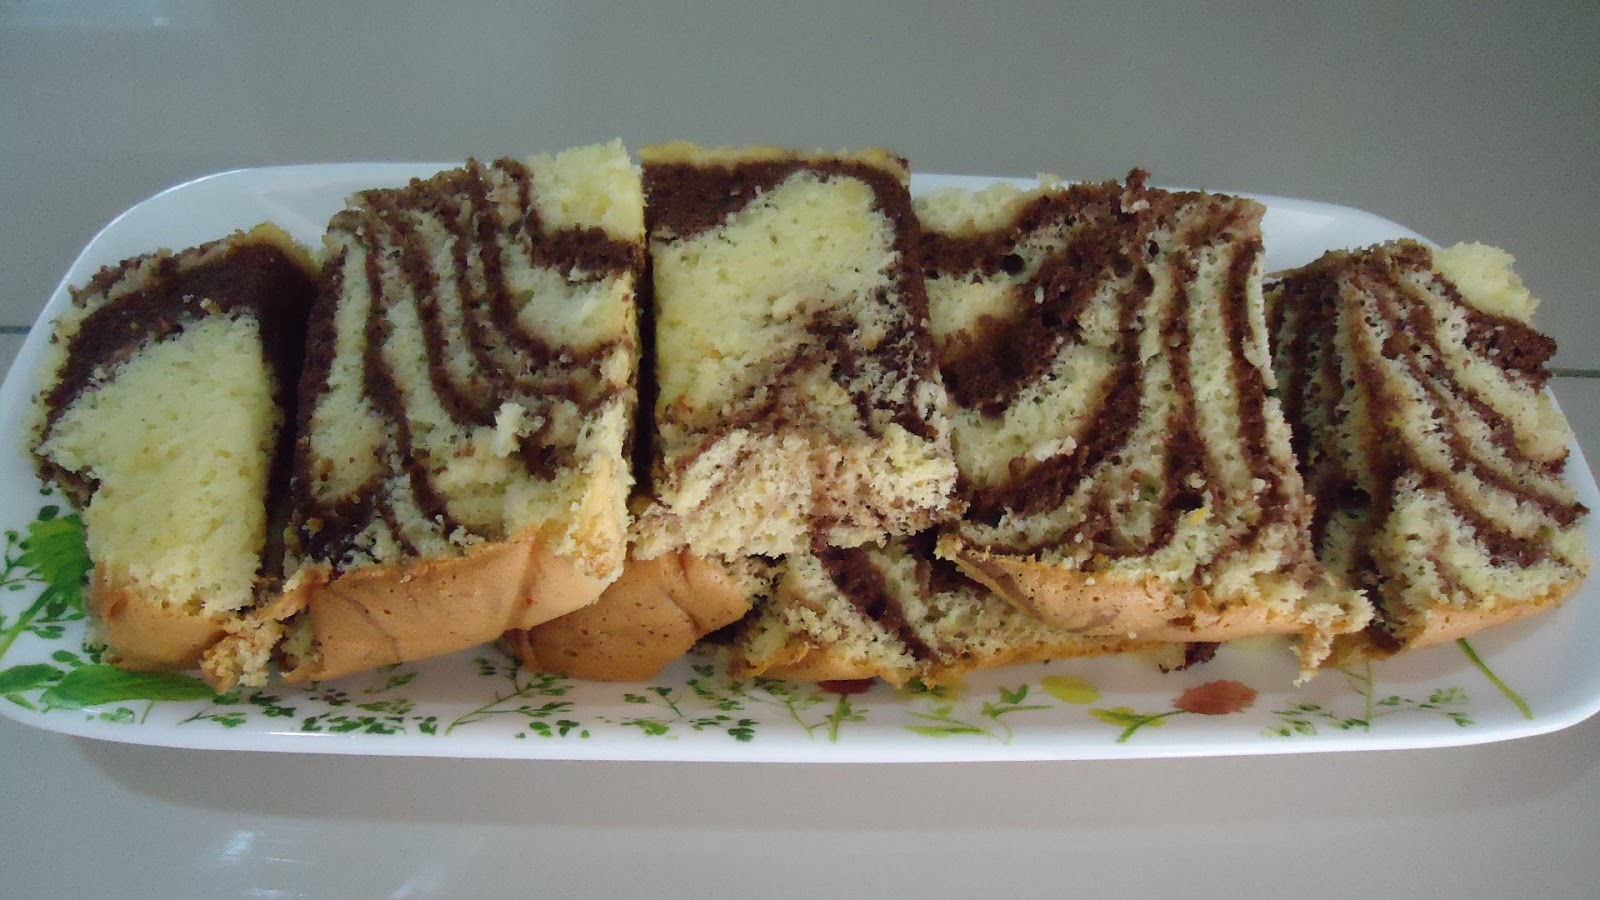 Zara baking orange chocolate sponge cake for Chocolate sponge ingredients